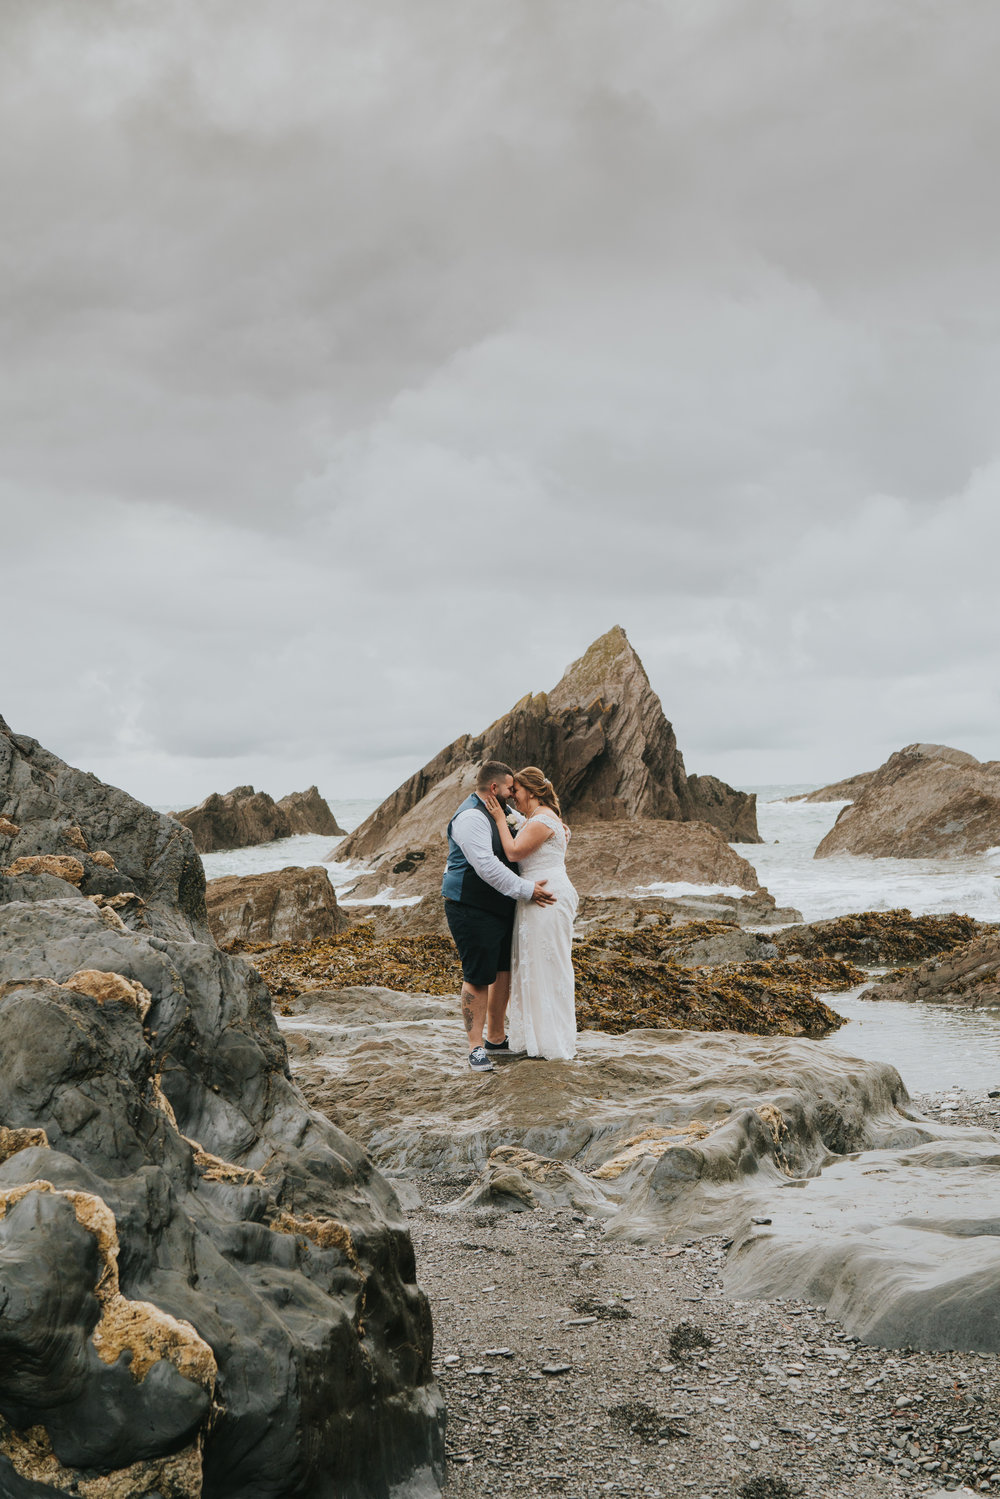 john-amy-relaxed-beach-wedding-tunnels-beaches-ilfracombe-north-devon-grace-elizabeth-colchester-essex-alternative-relaxed-wedding-photography-devon-suffolk-norfolk-essex (138 of 159).jpg